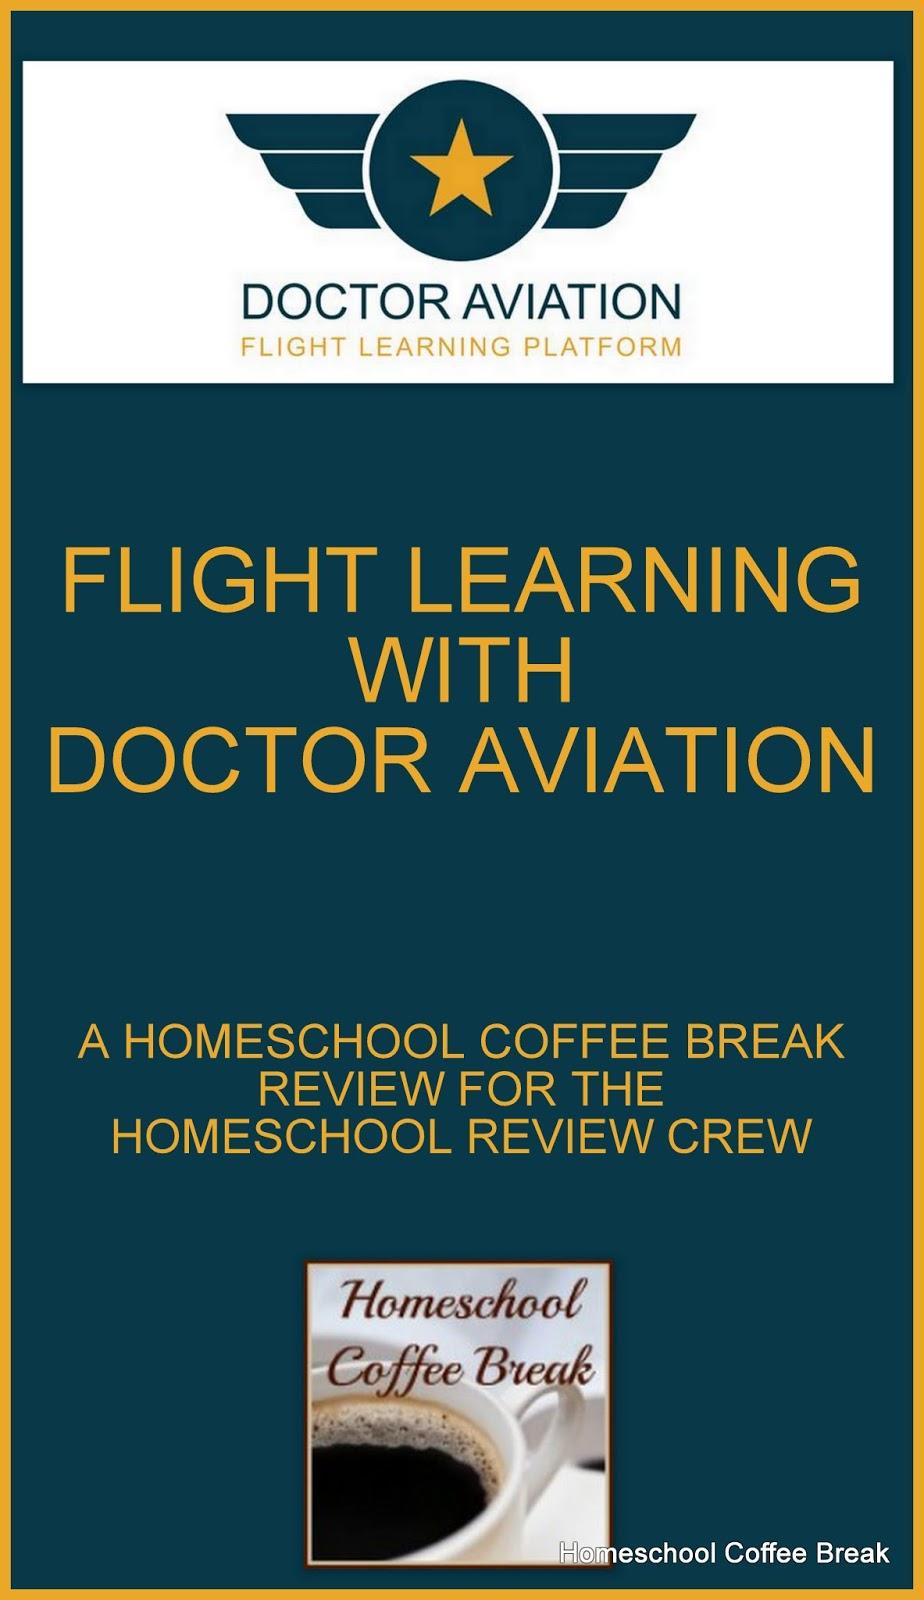 IATA - Distance Learning